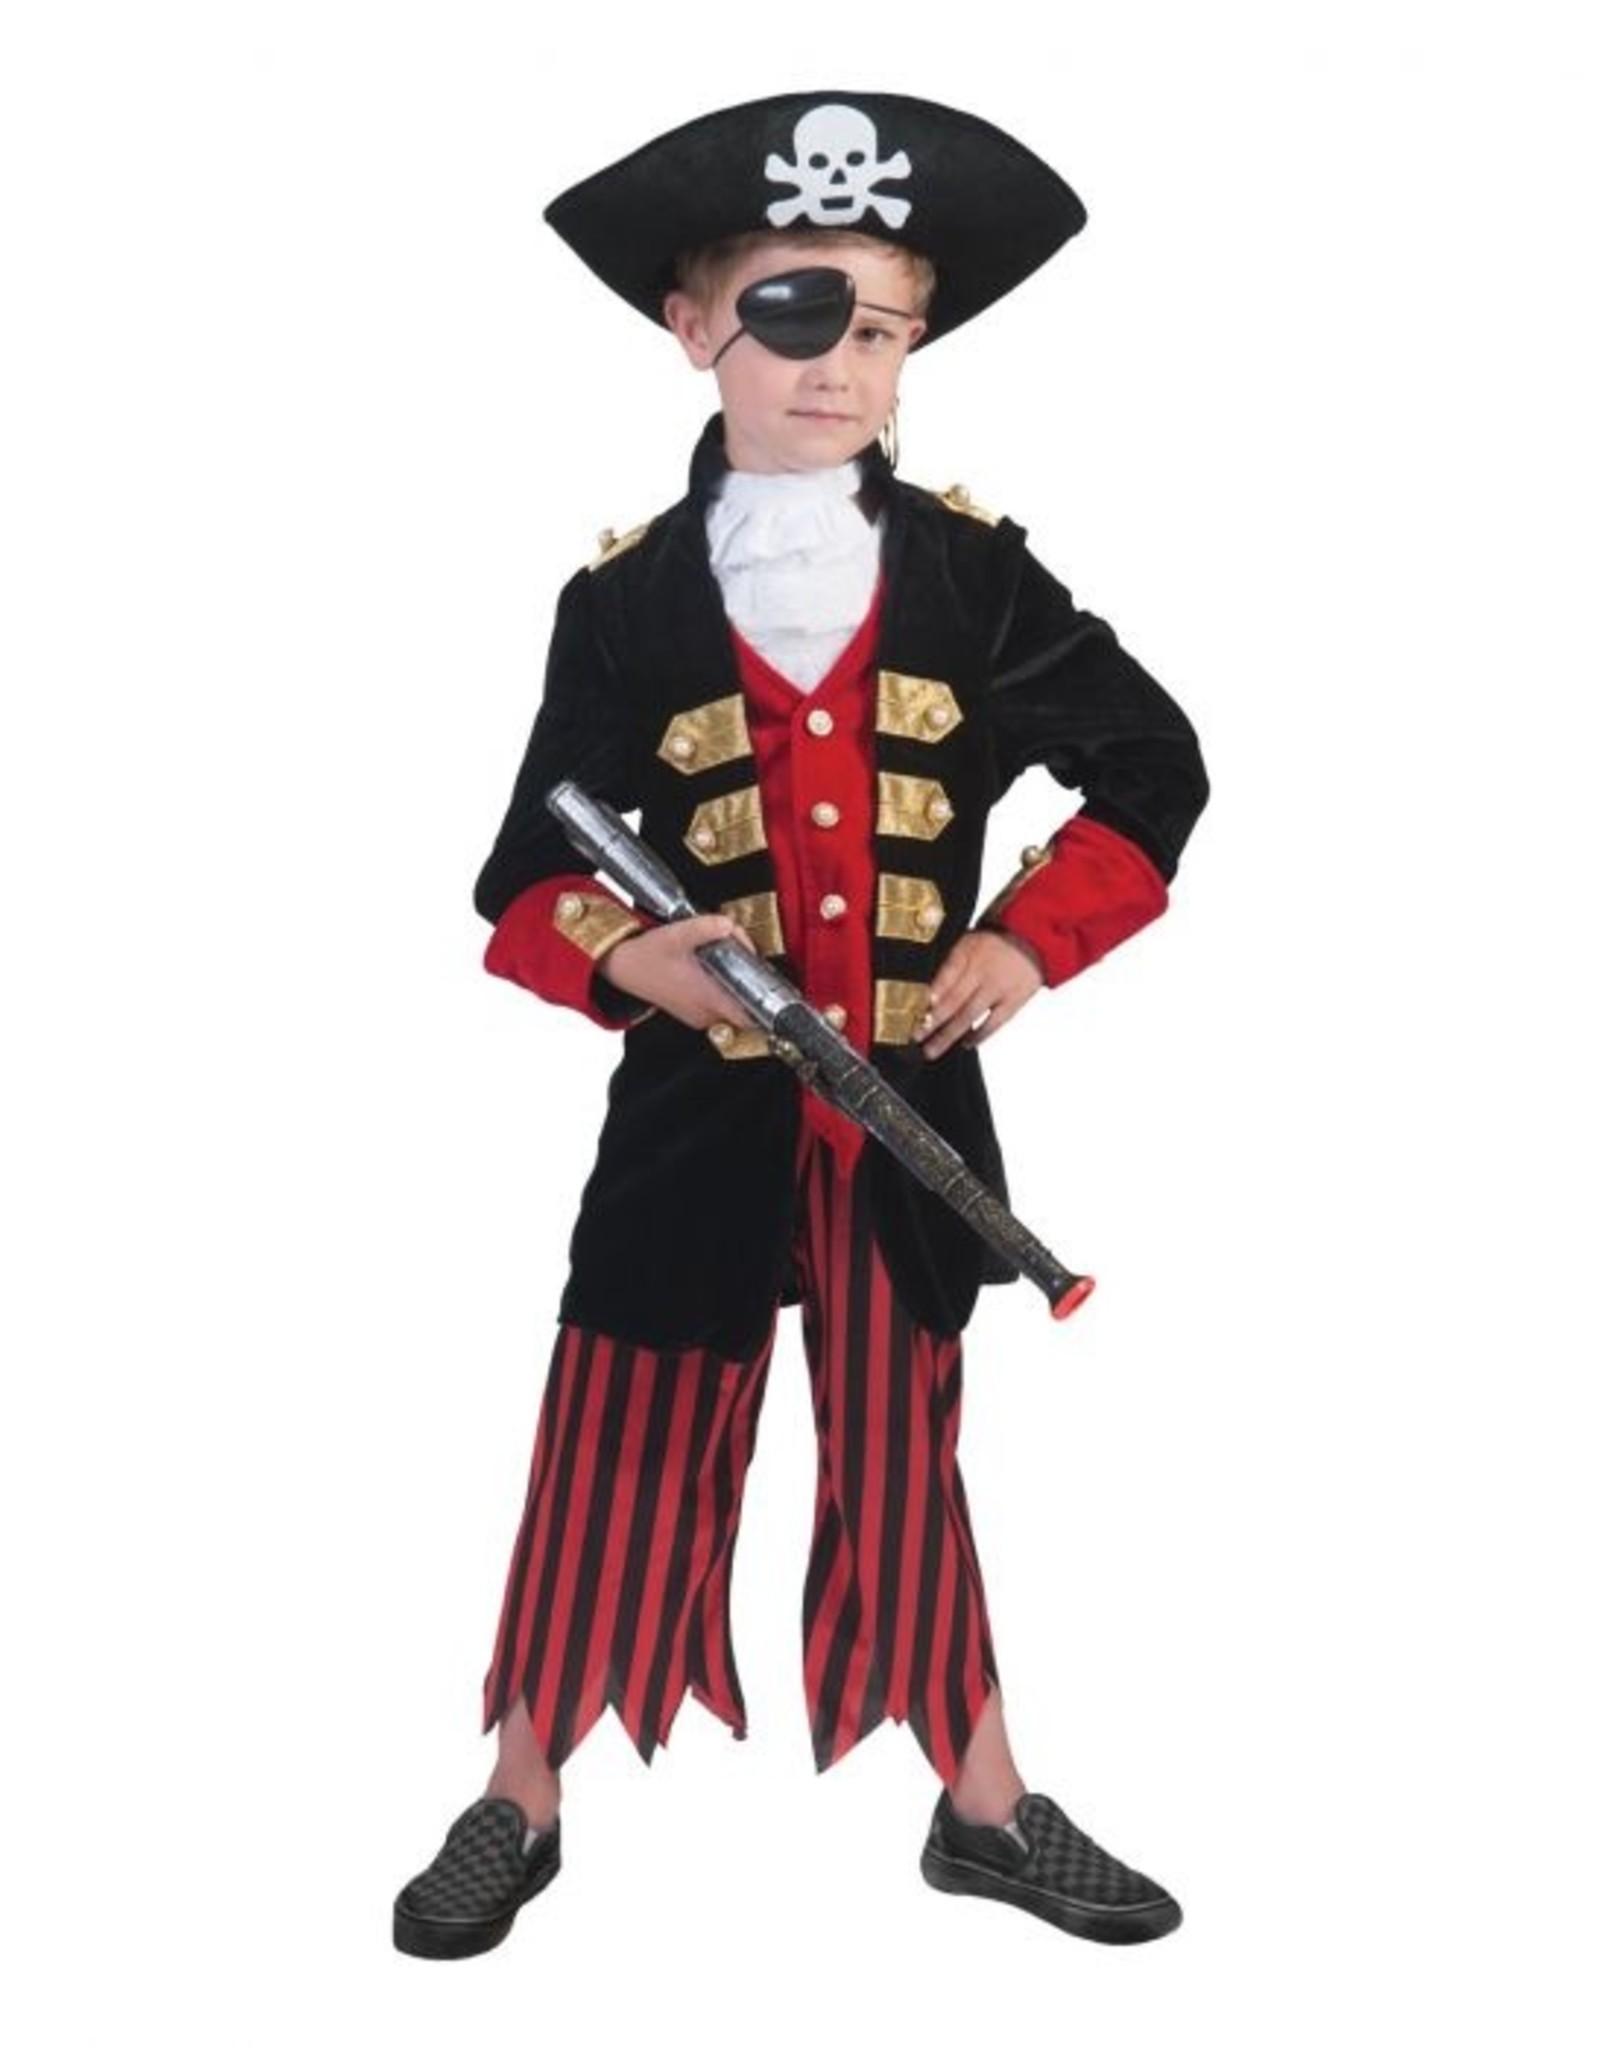 Funny Fashion Piraten kostuum Florian kind jongen